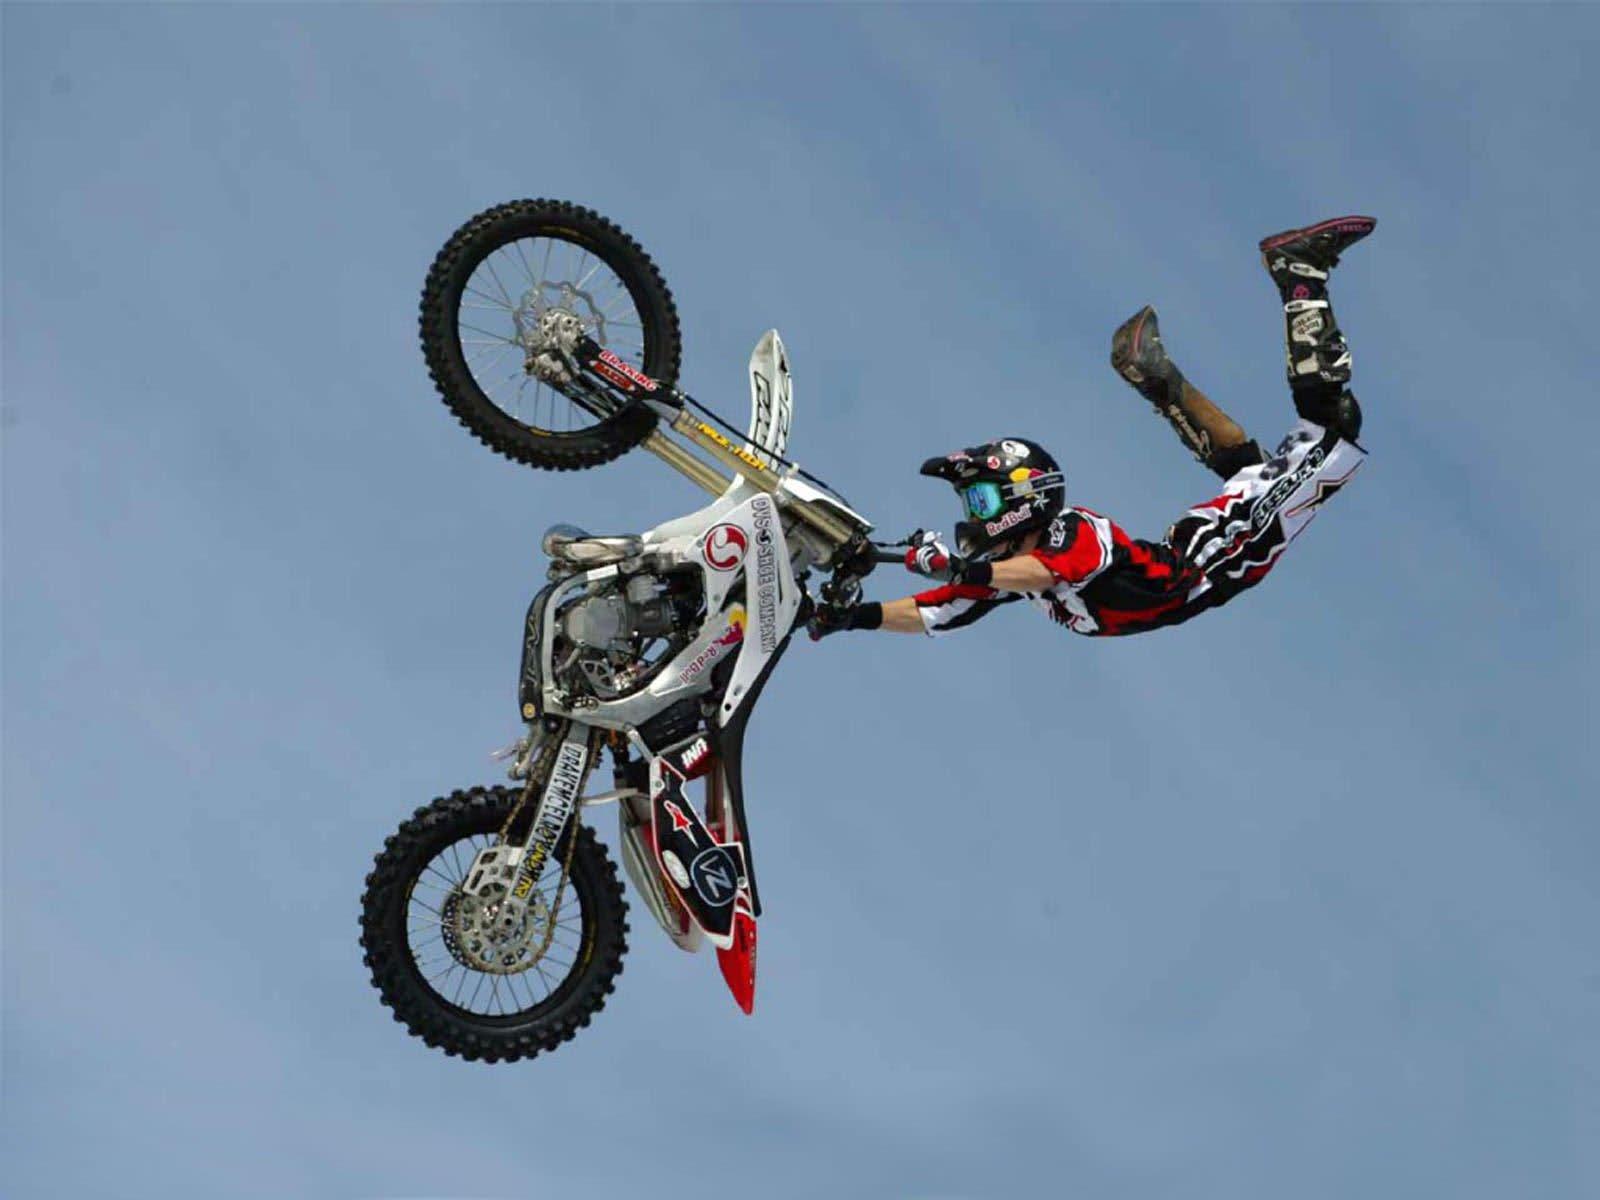 Freestyle motocross bikes